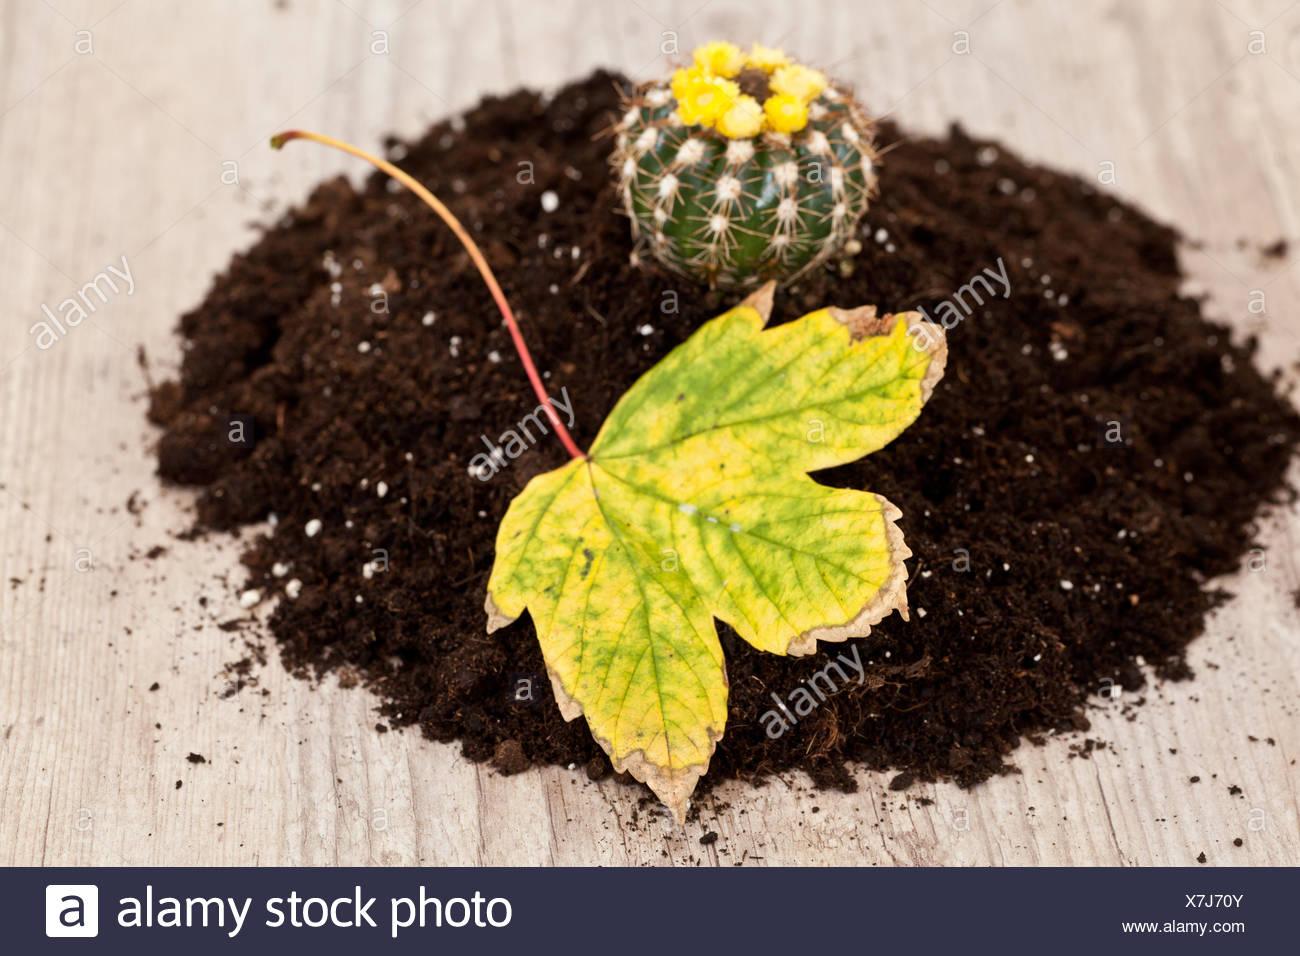 botany, decoration, cactus, maddening, pert, coquettish, cute, garden, ground, - Stock Image